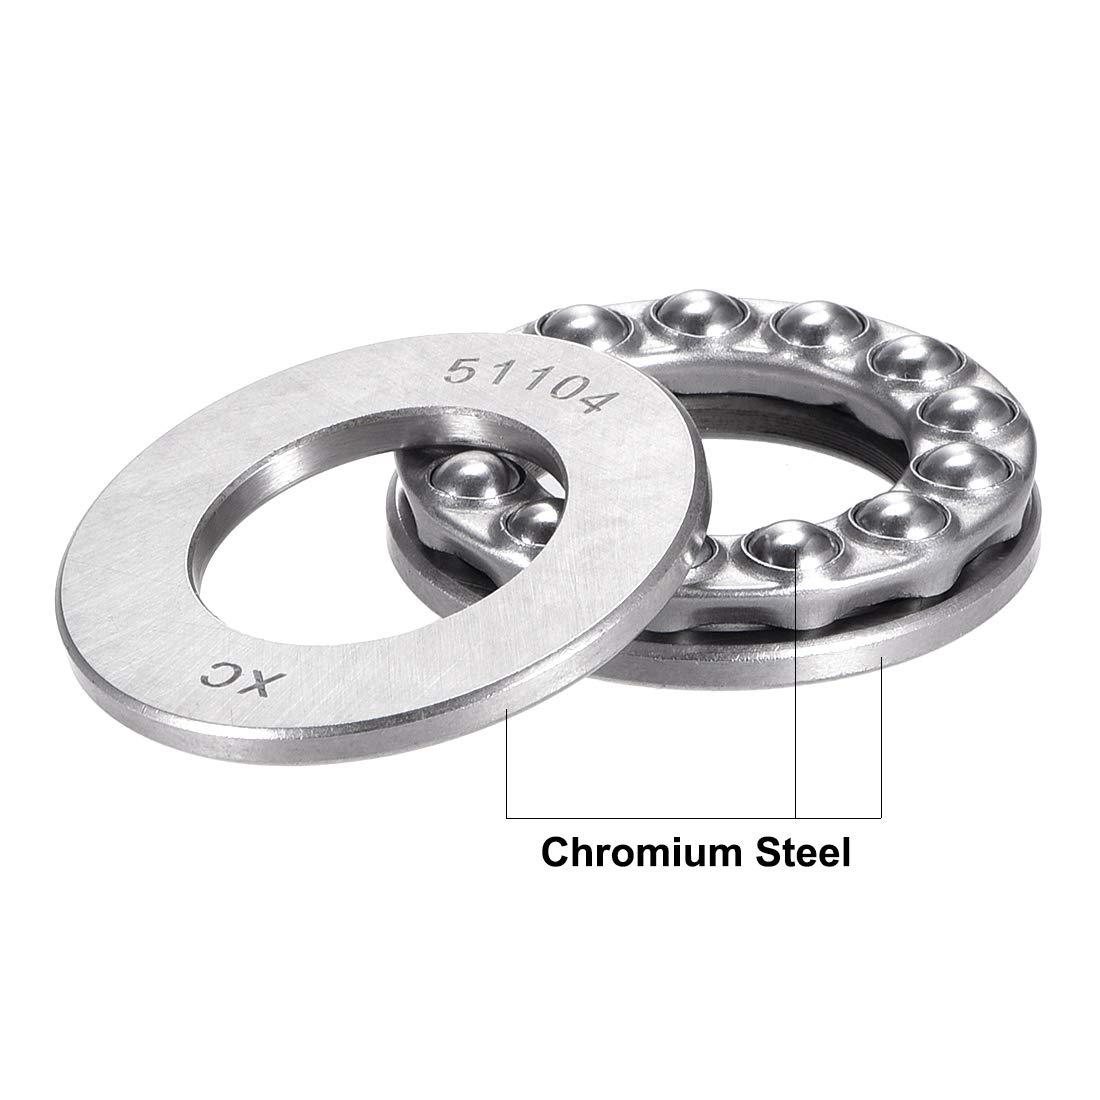 sourcingmap 51101 Single Direction Thrust Ball Bearings Flat Seat Chromium Steel,12x26x9mm 2pcs